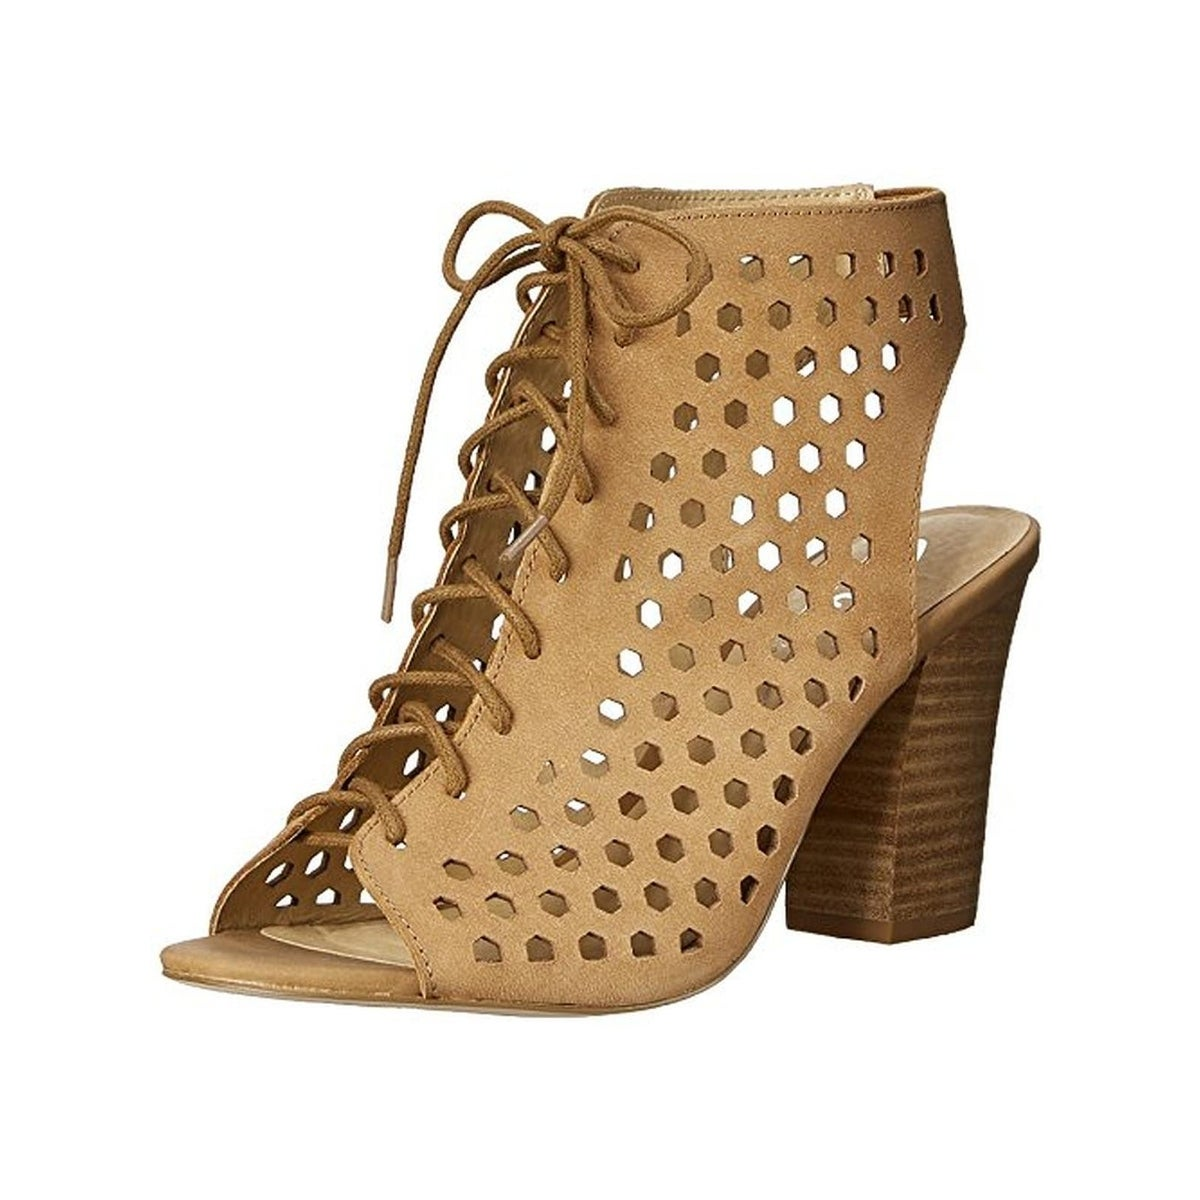 d513fb9835 Buy Tan Women's Sandals Online at Overstock | Our Best Women's Shoes Deals